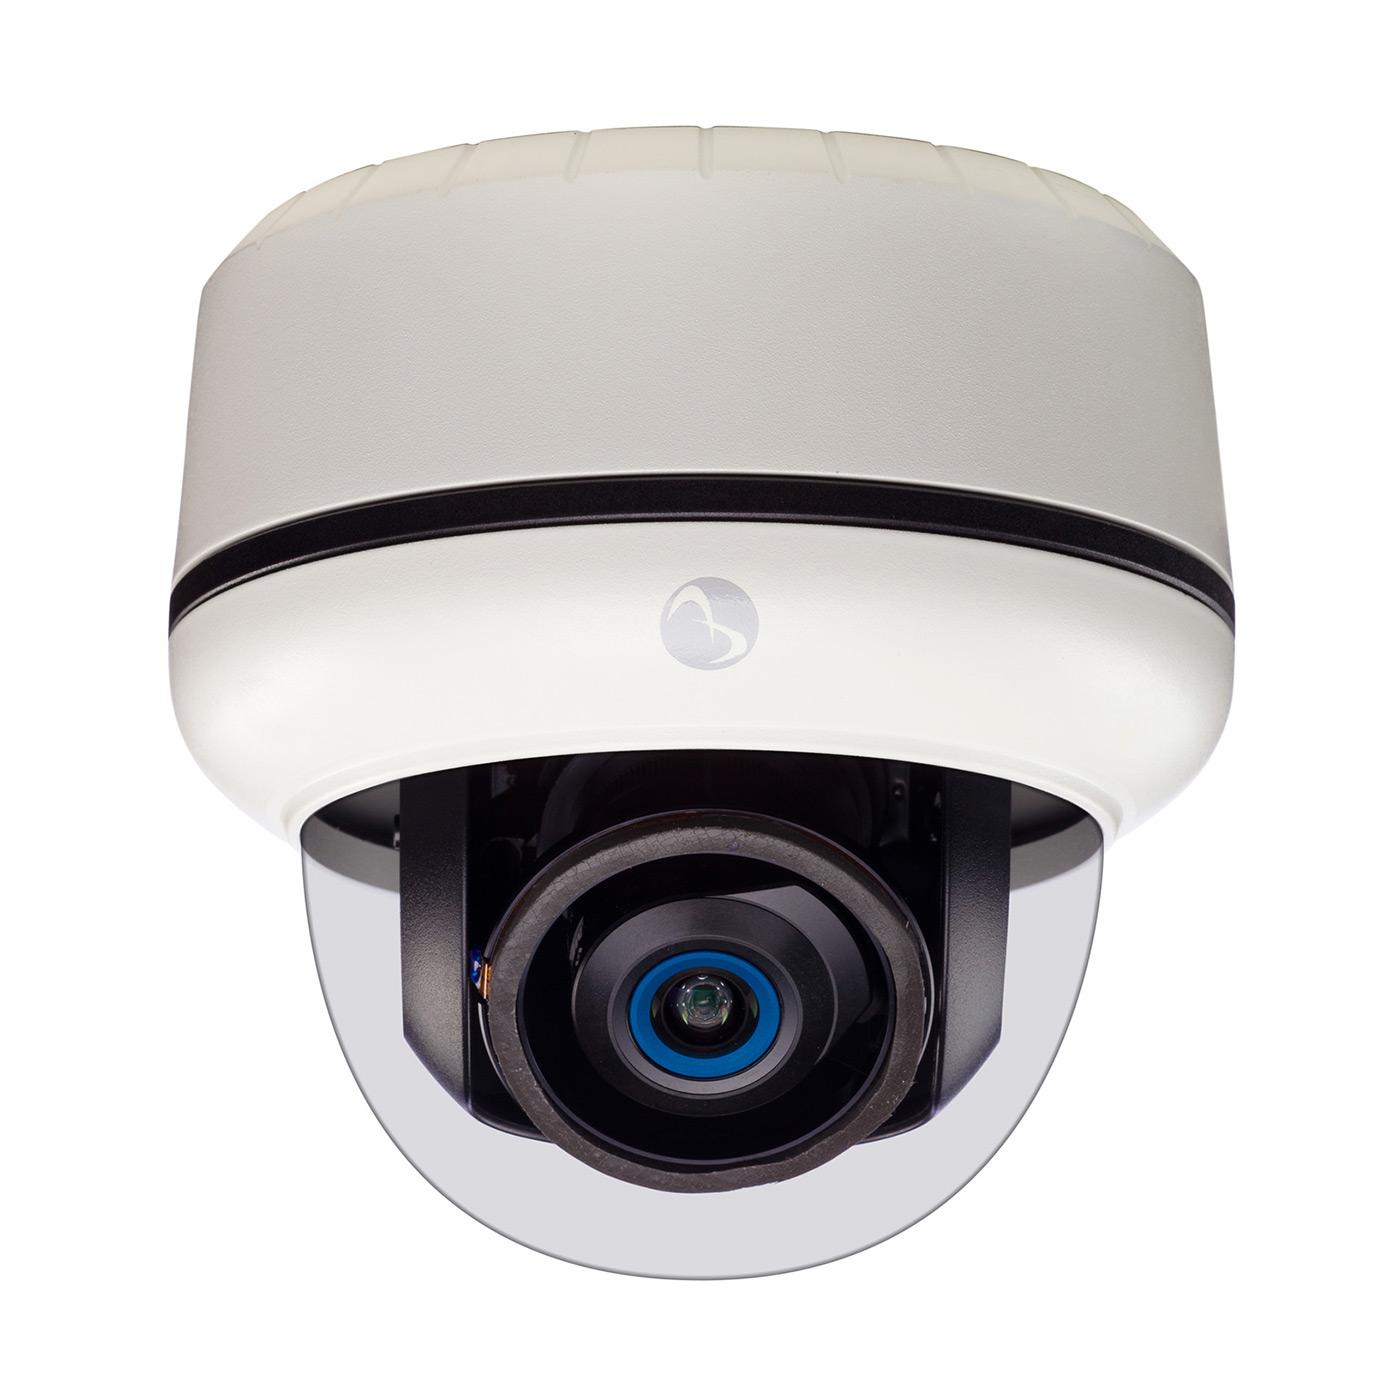 Illustra Pro 600 610 Mini Dome Indoor Camera